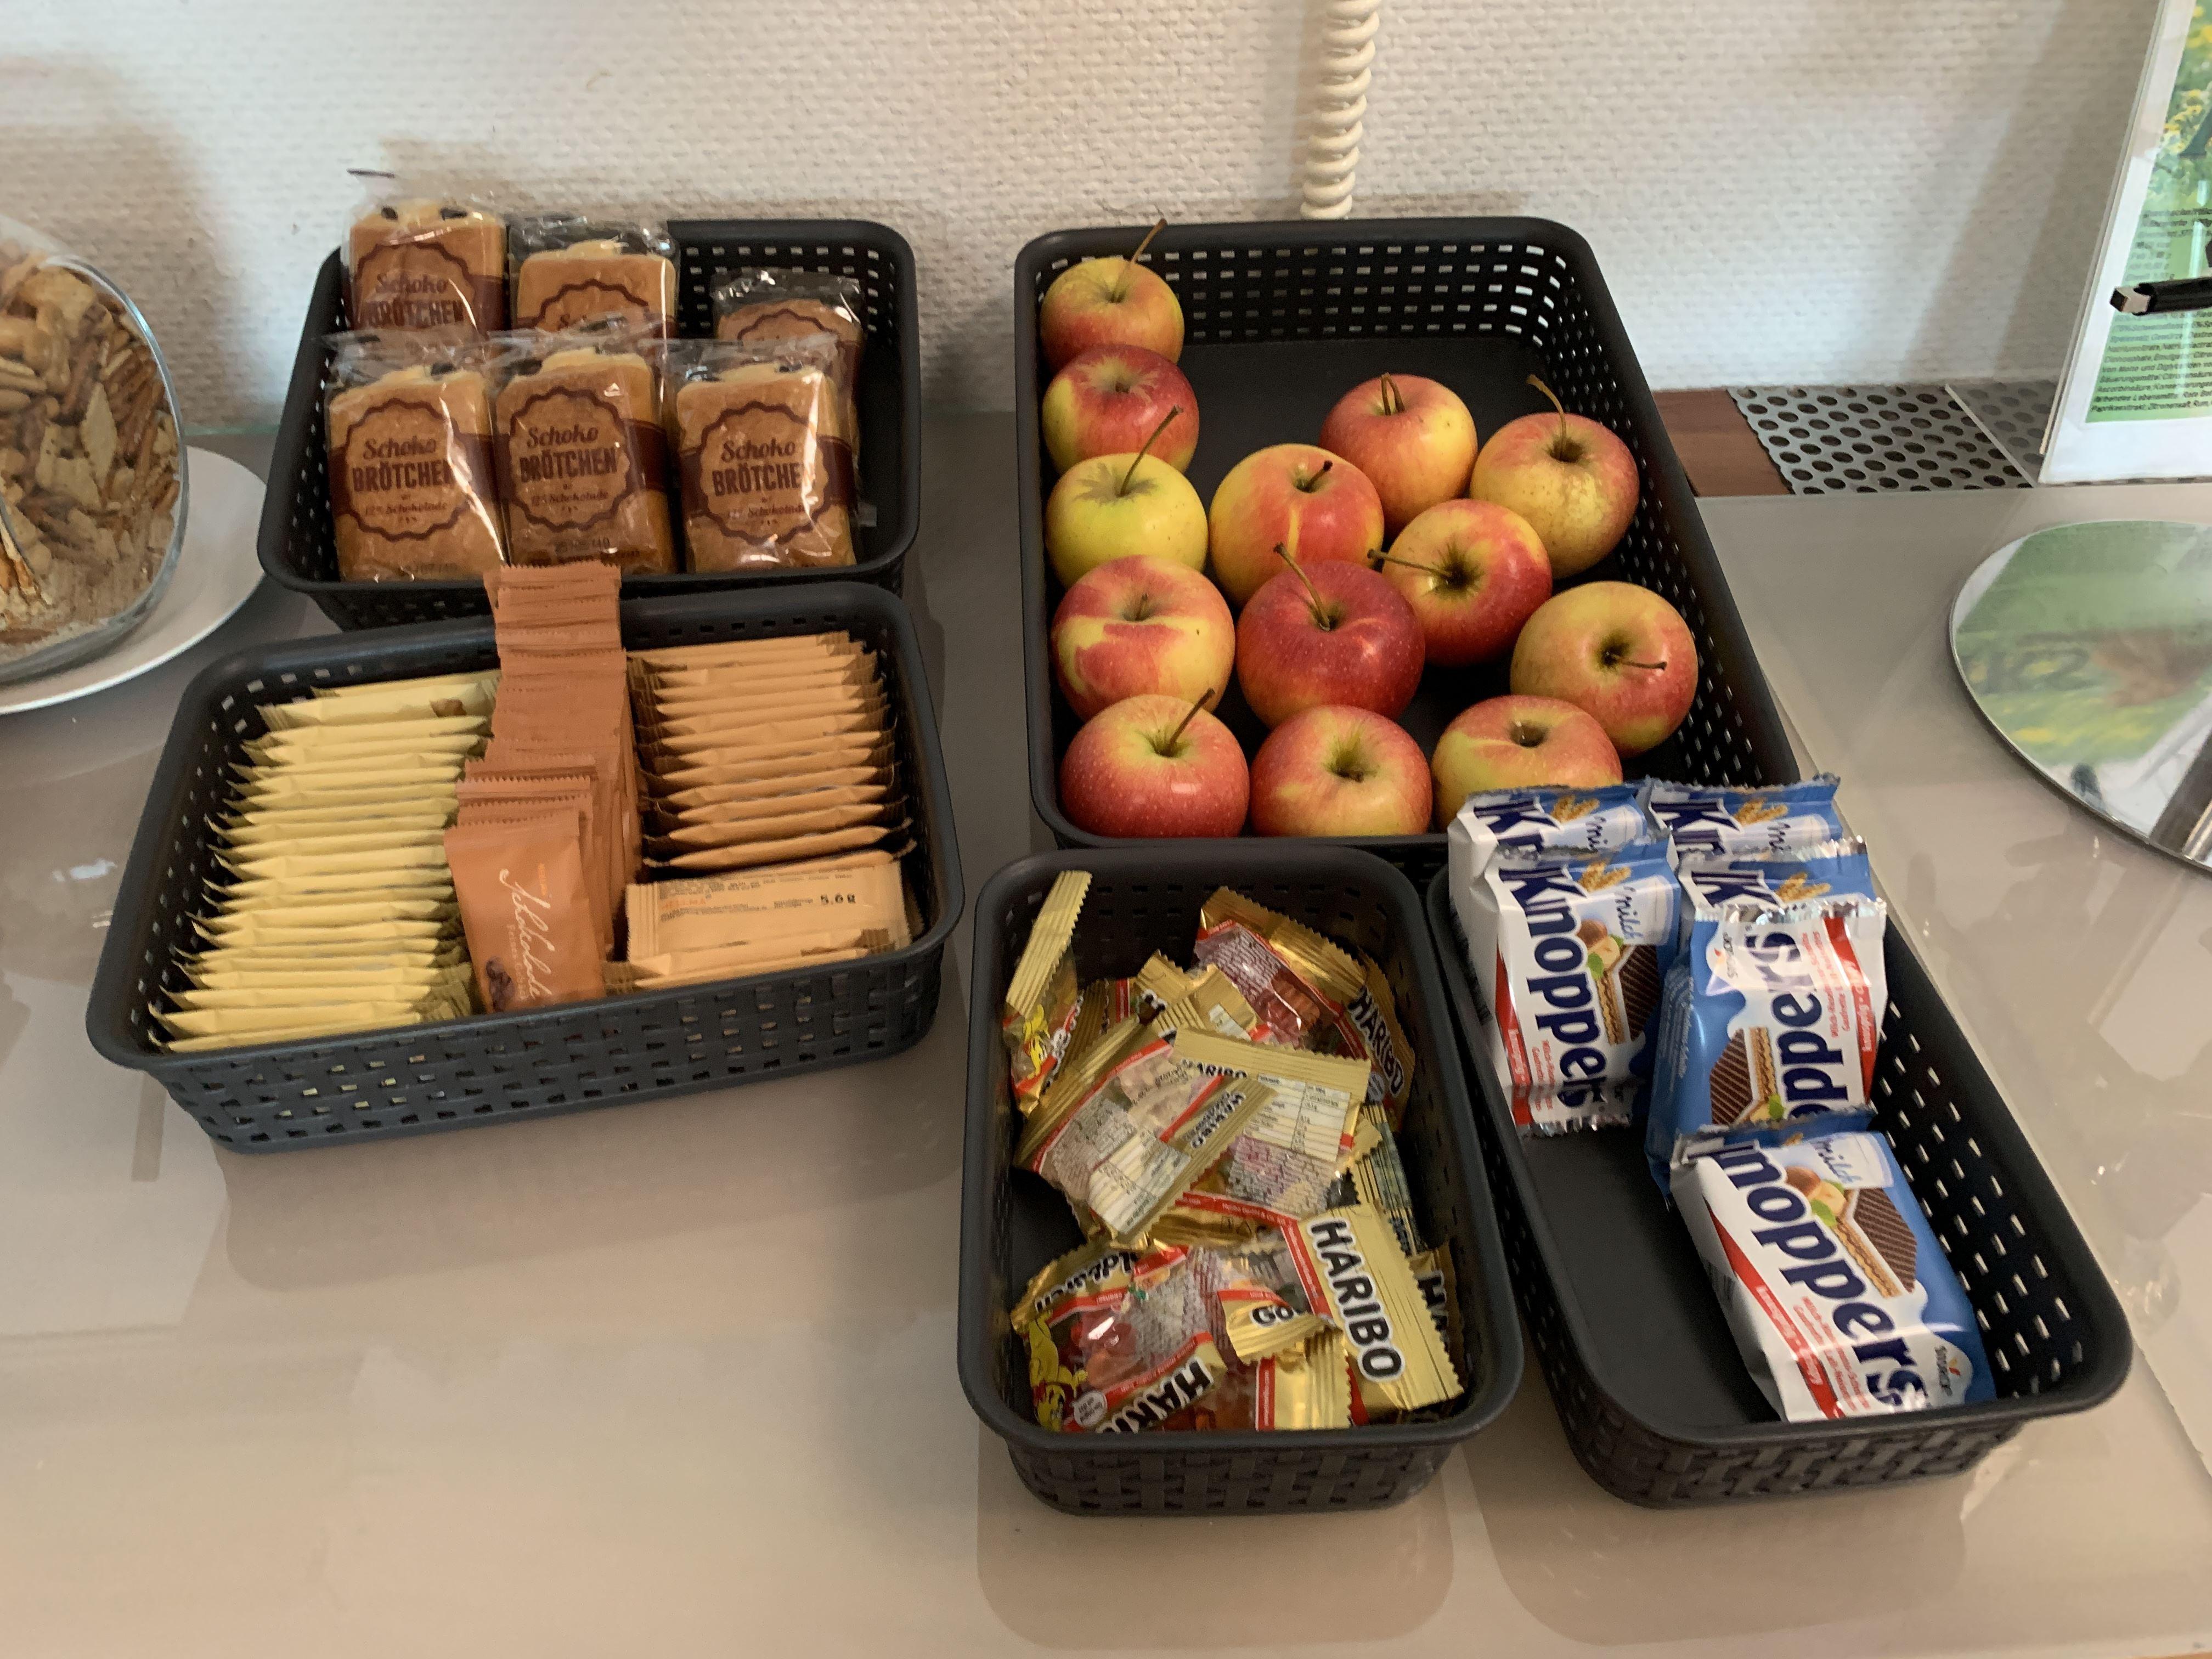 Snacks Berlin Schönefeld Airport Priority Pass Lounge